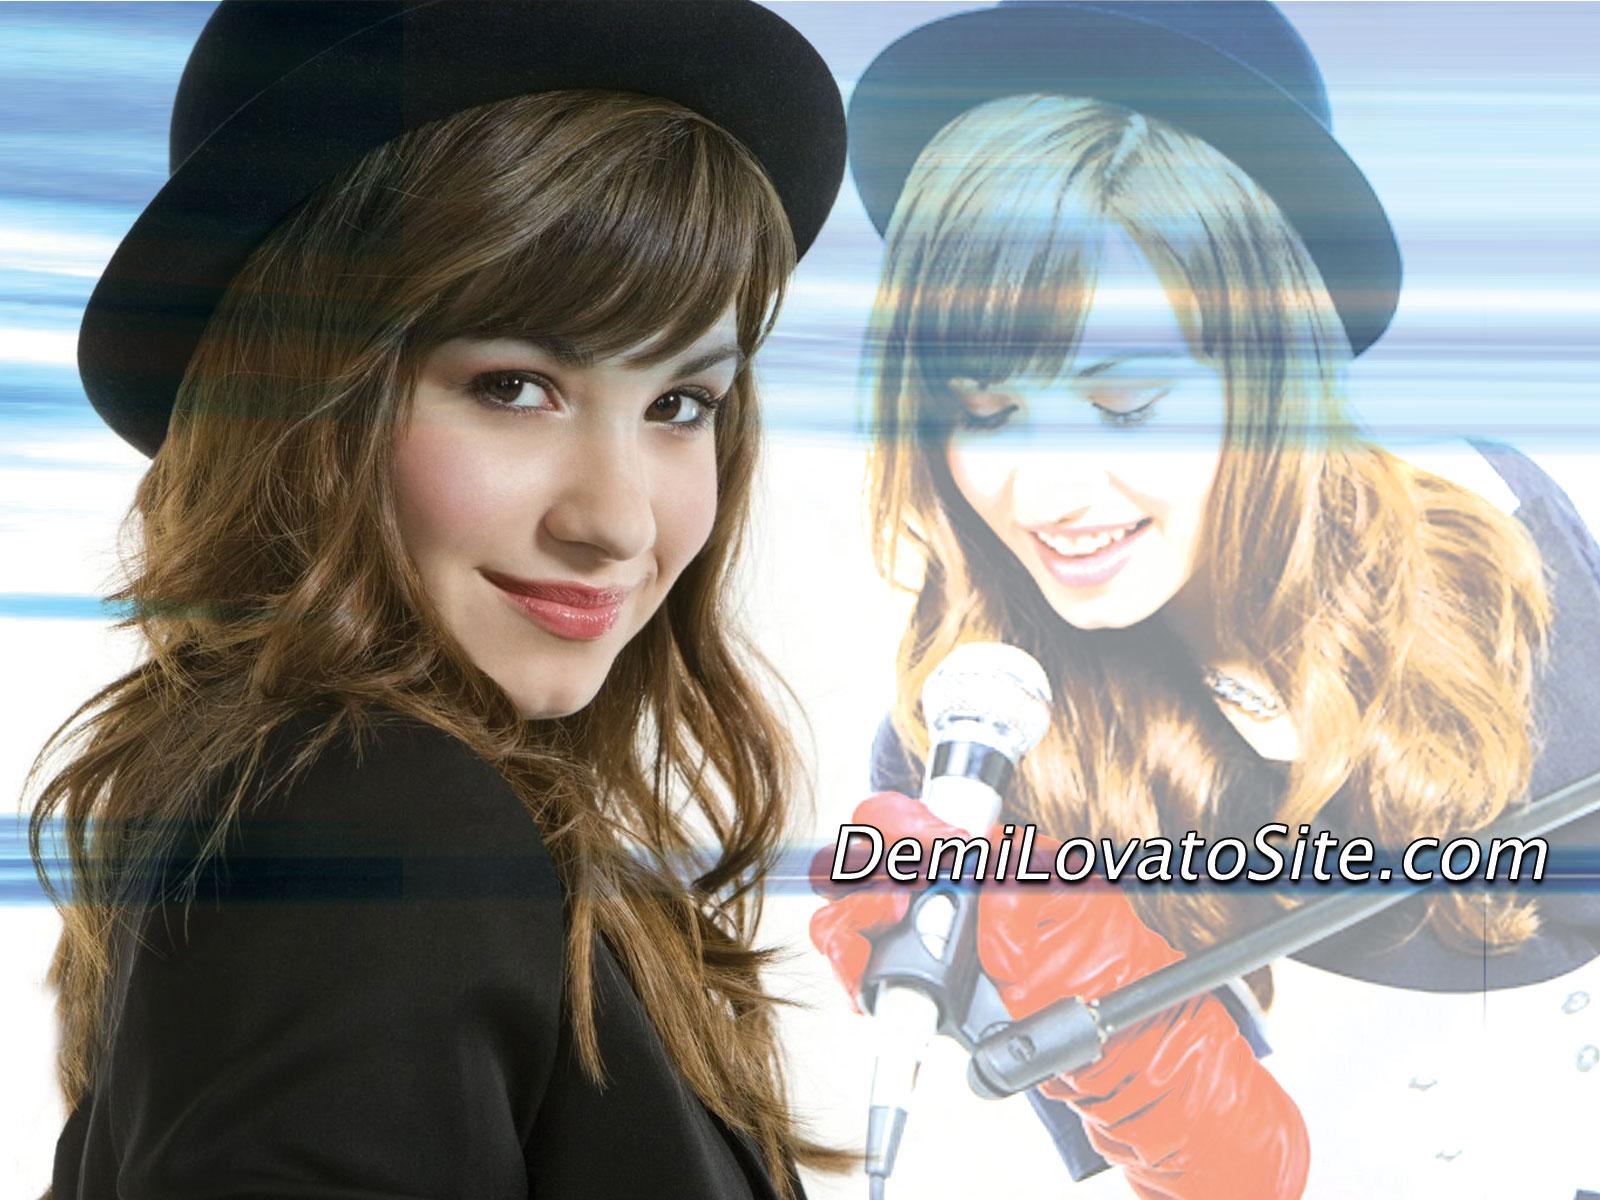 Cartoon Cute Girl Desktop Wallpapers Cute Girl Demi Lovato Wallpapers Desktop Background